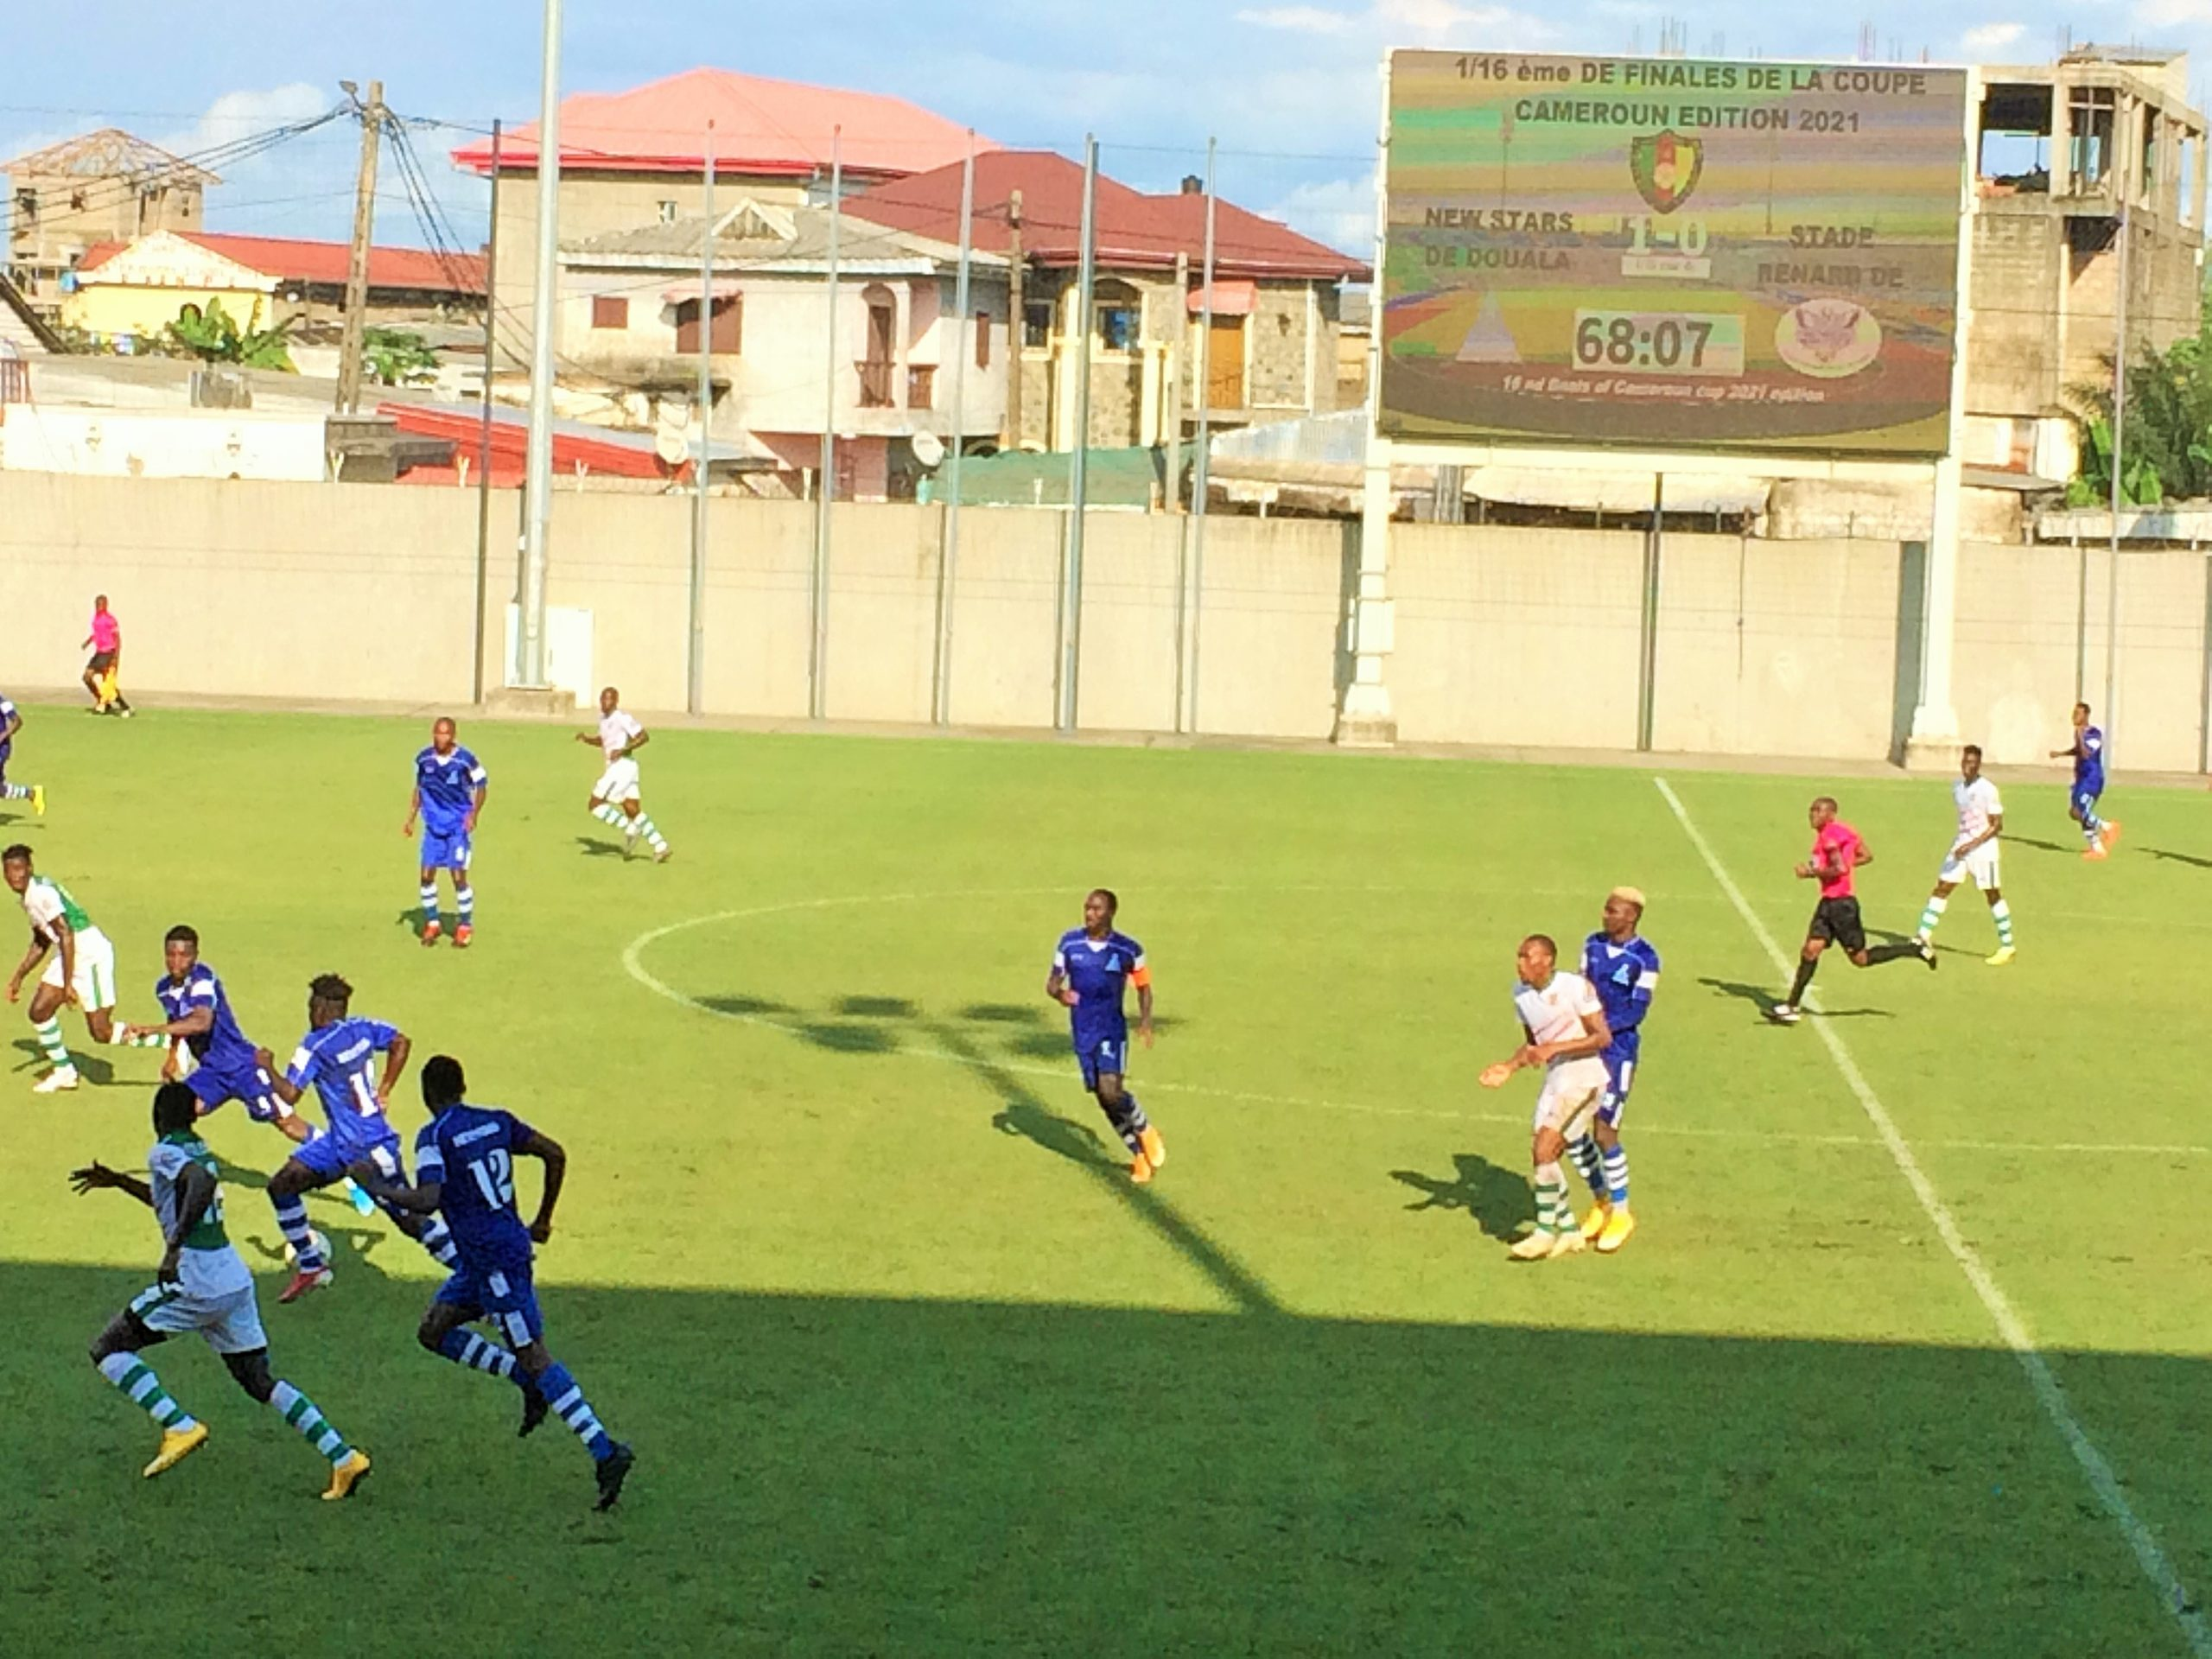 Une phase de jeu entre Stade Renard de Melong et New Stars de Douala en coupe du cameroun. Photo: Moustapha Oumarou